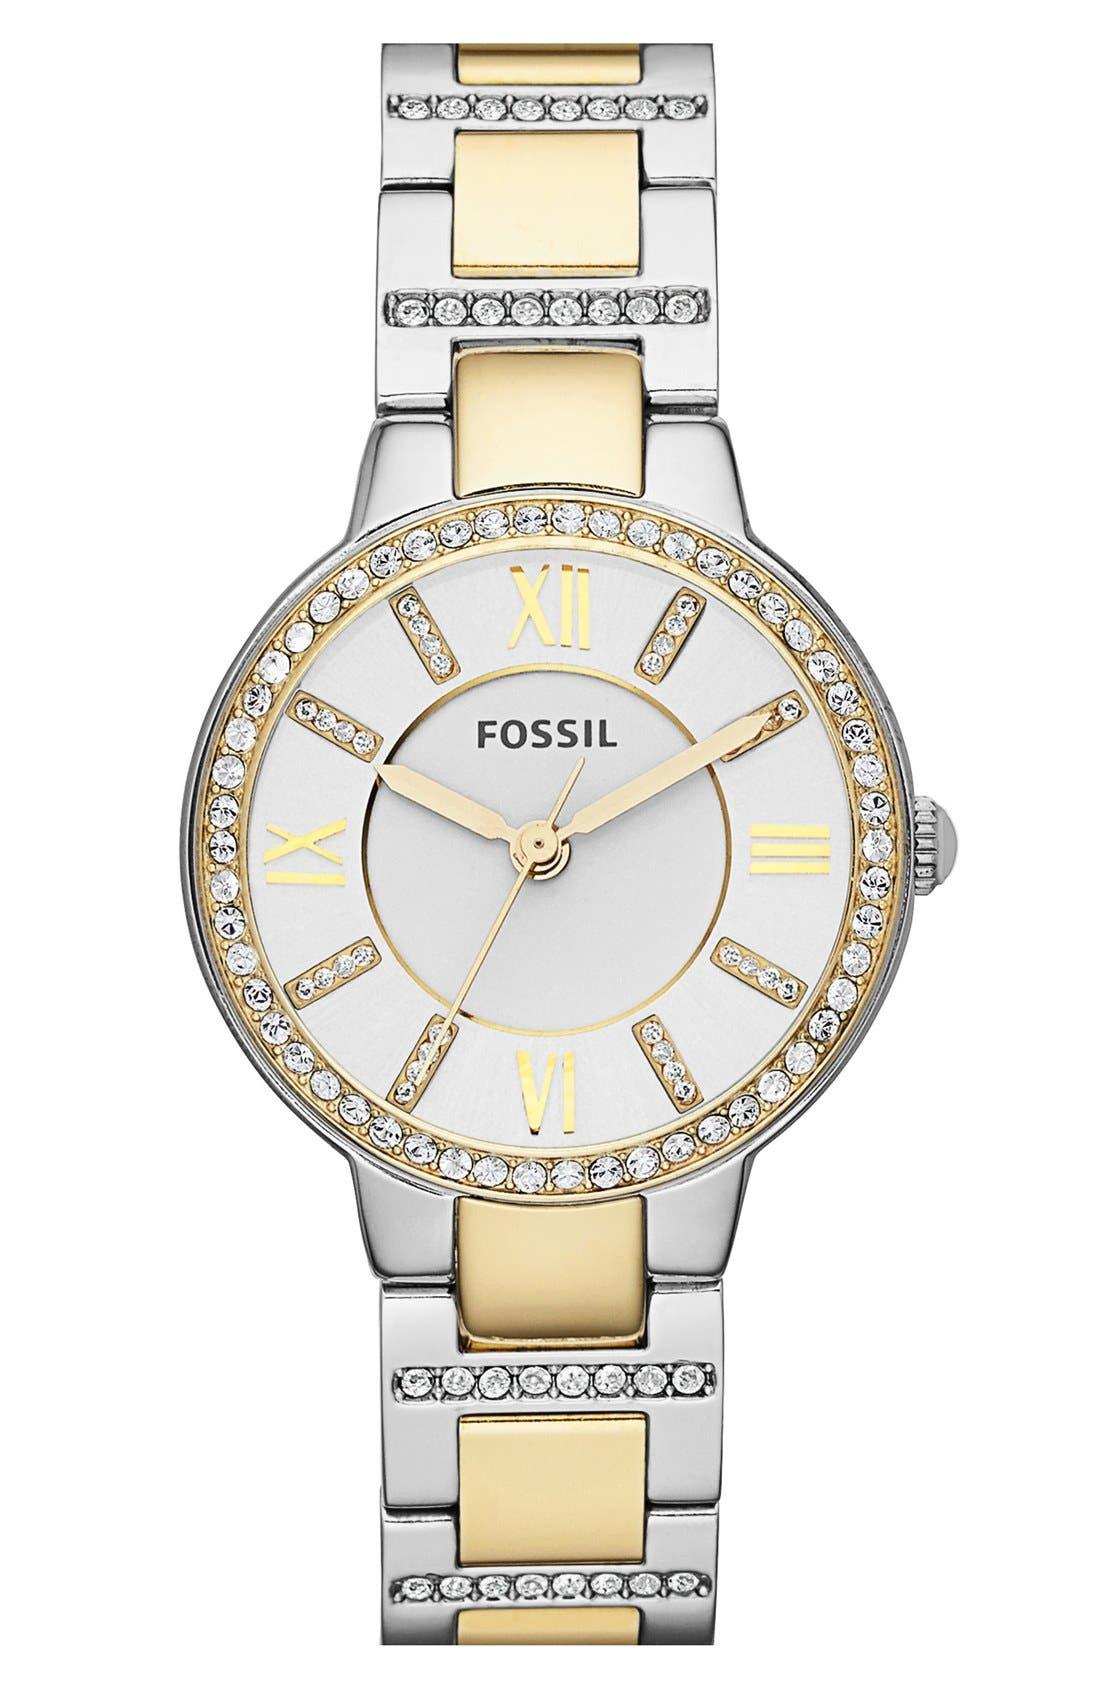 Main Image - Fossil 'Virginia' Crystal Bezel Bracelet Watch, 34mm